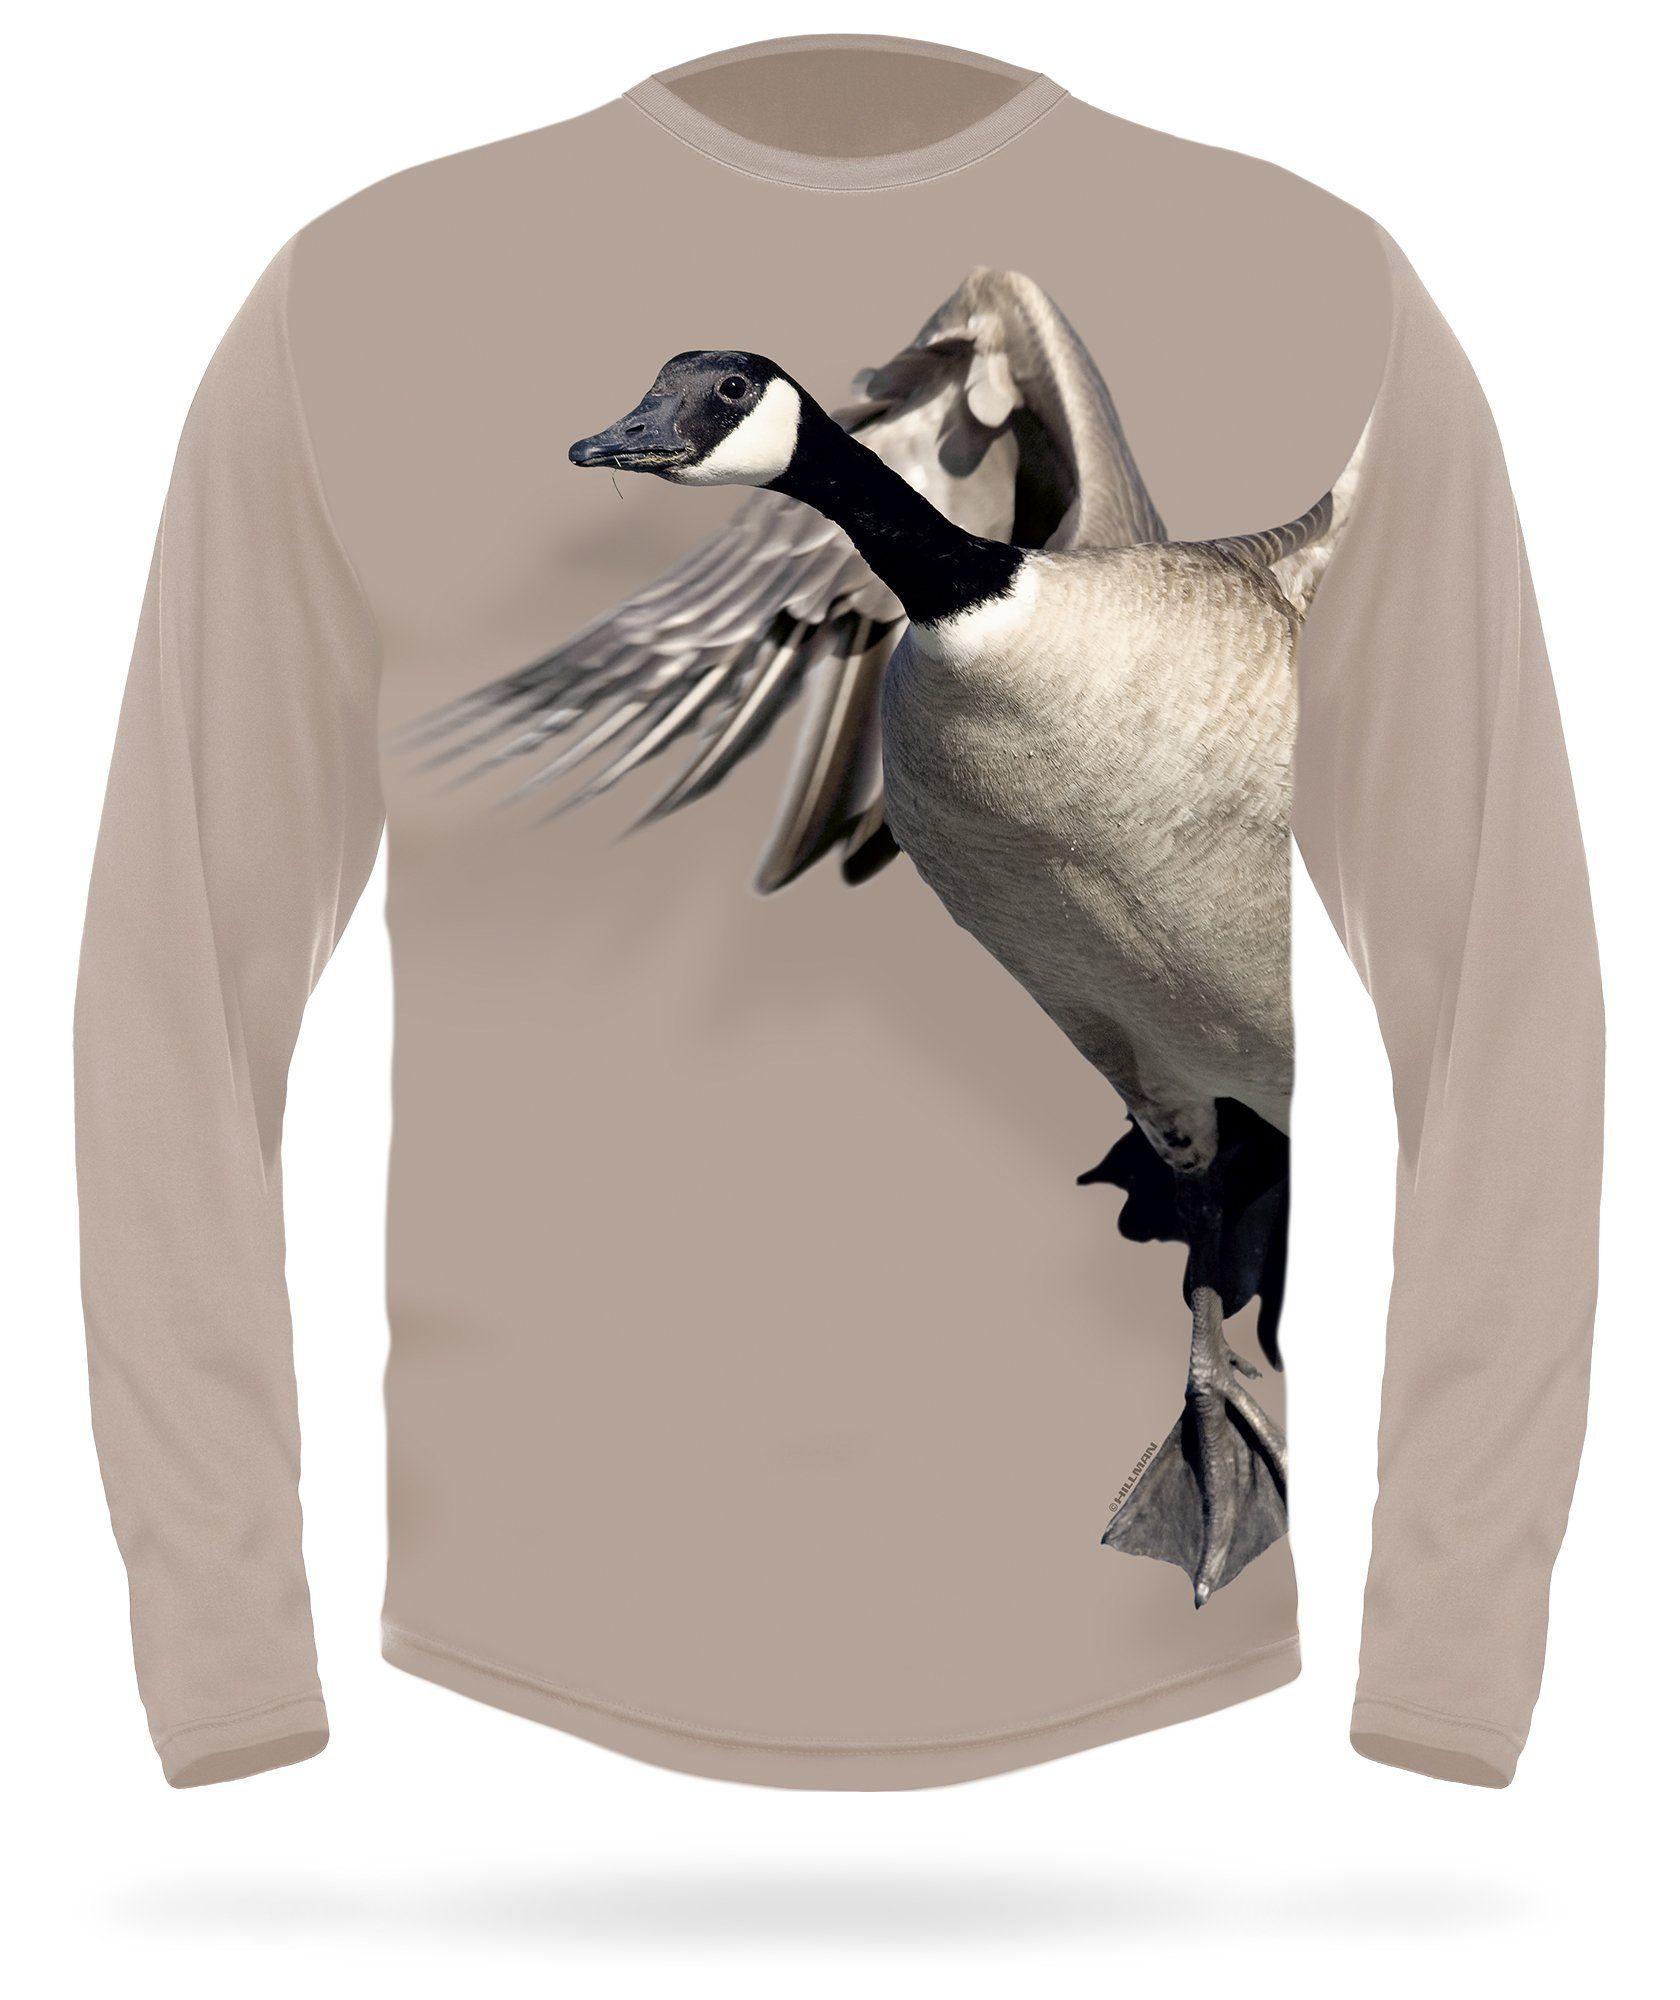 Canada goose side long sleeve tshirt long sleeve tshirt